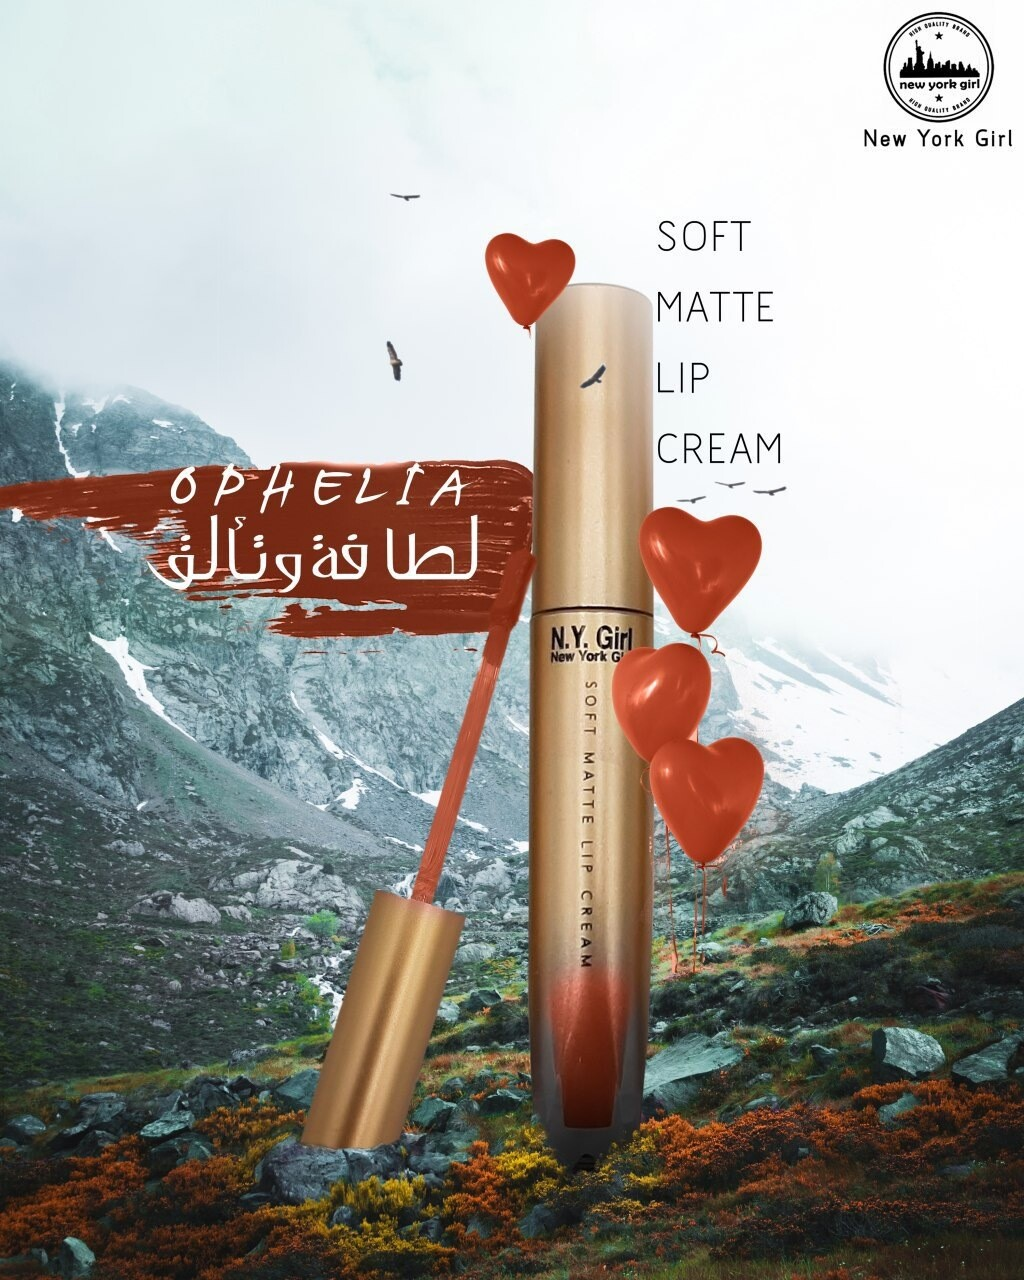 Soft Matte Lip Cream - Ophelia